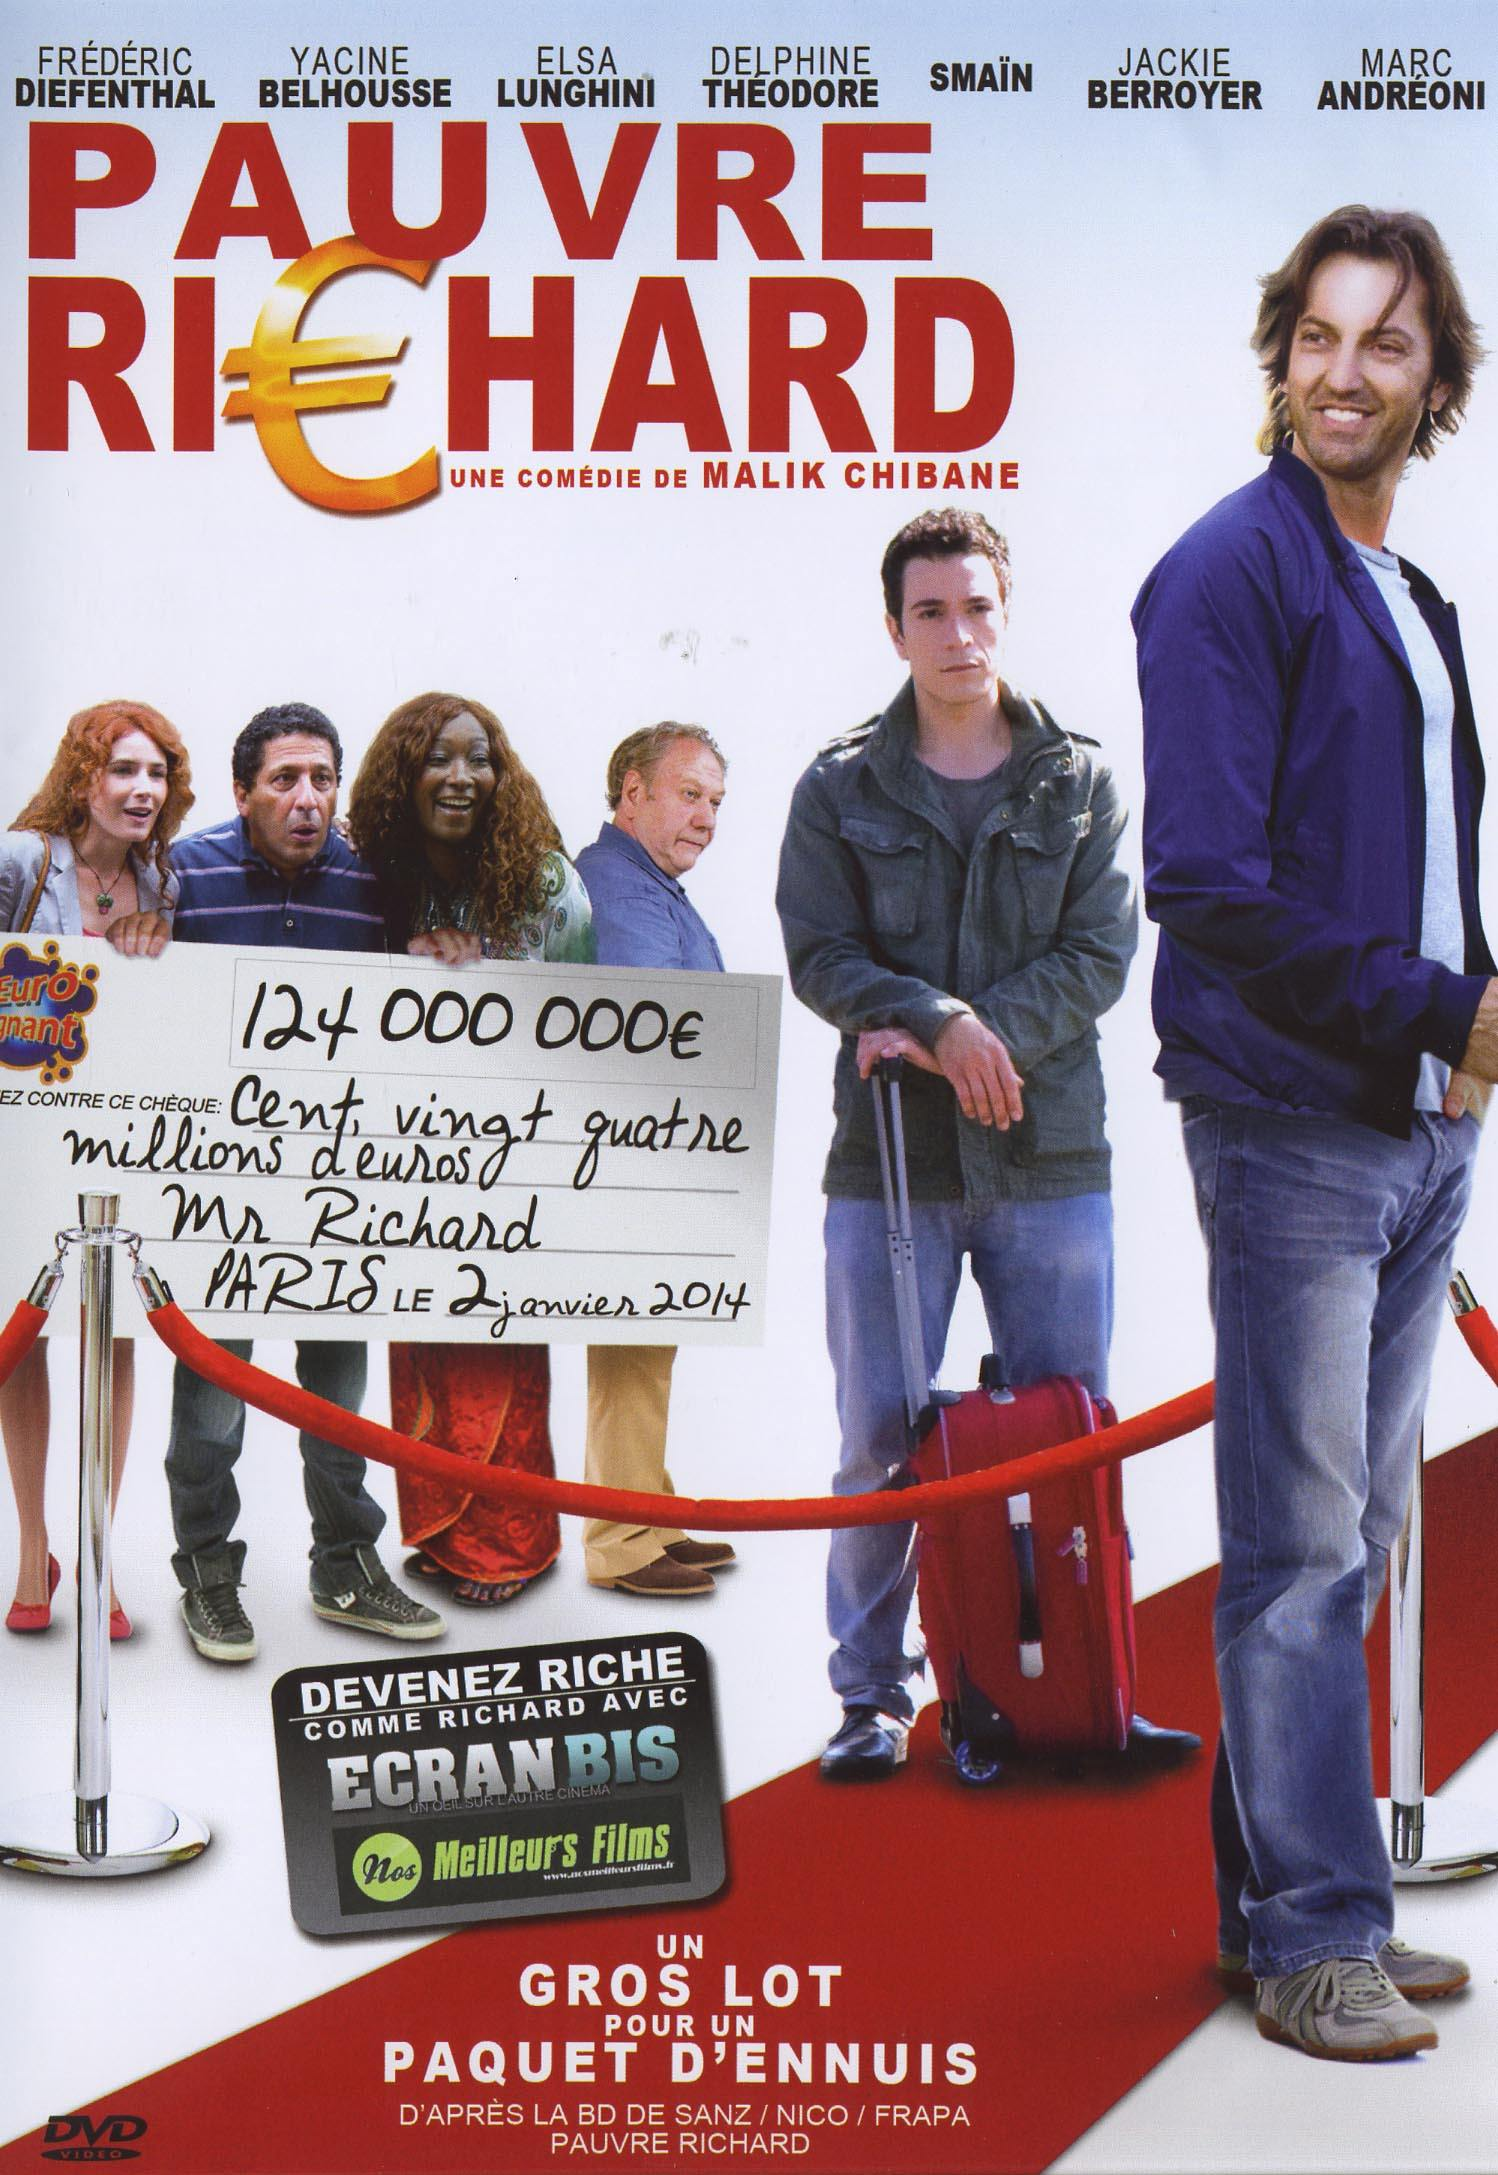 Pauvre richard - dvd